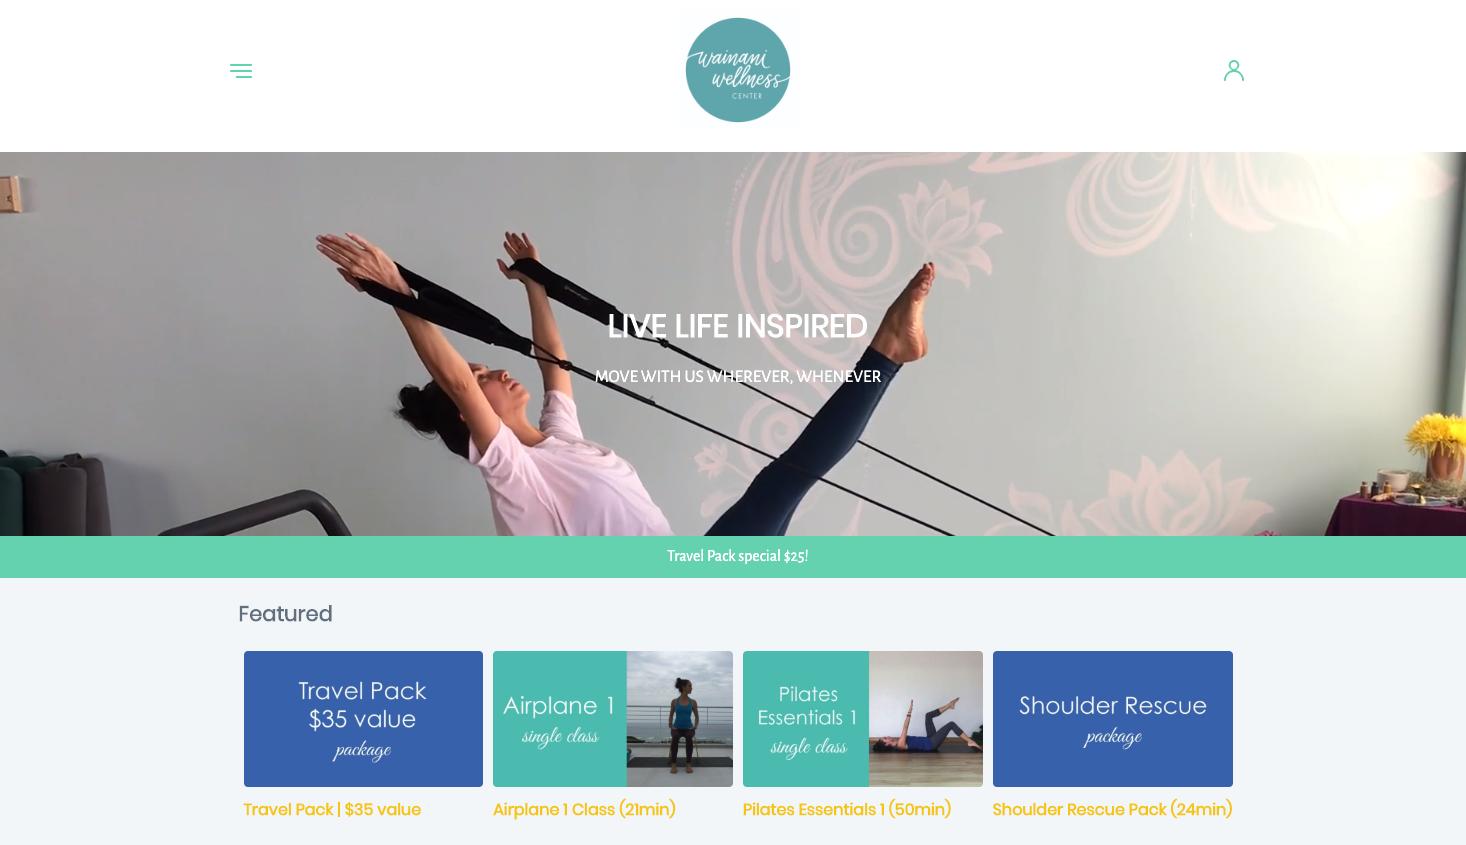 Wainani Wellness Videos - Site Setup, Customization, Digital Goods E-commerce, Image Curation